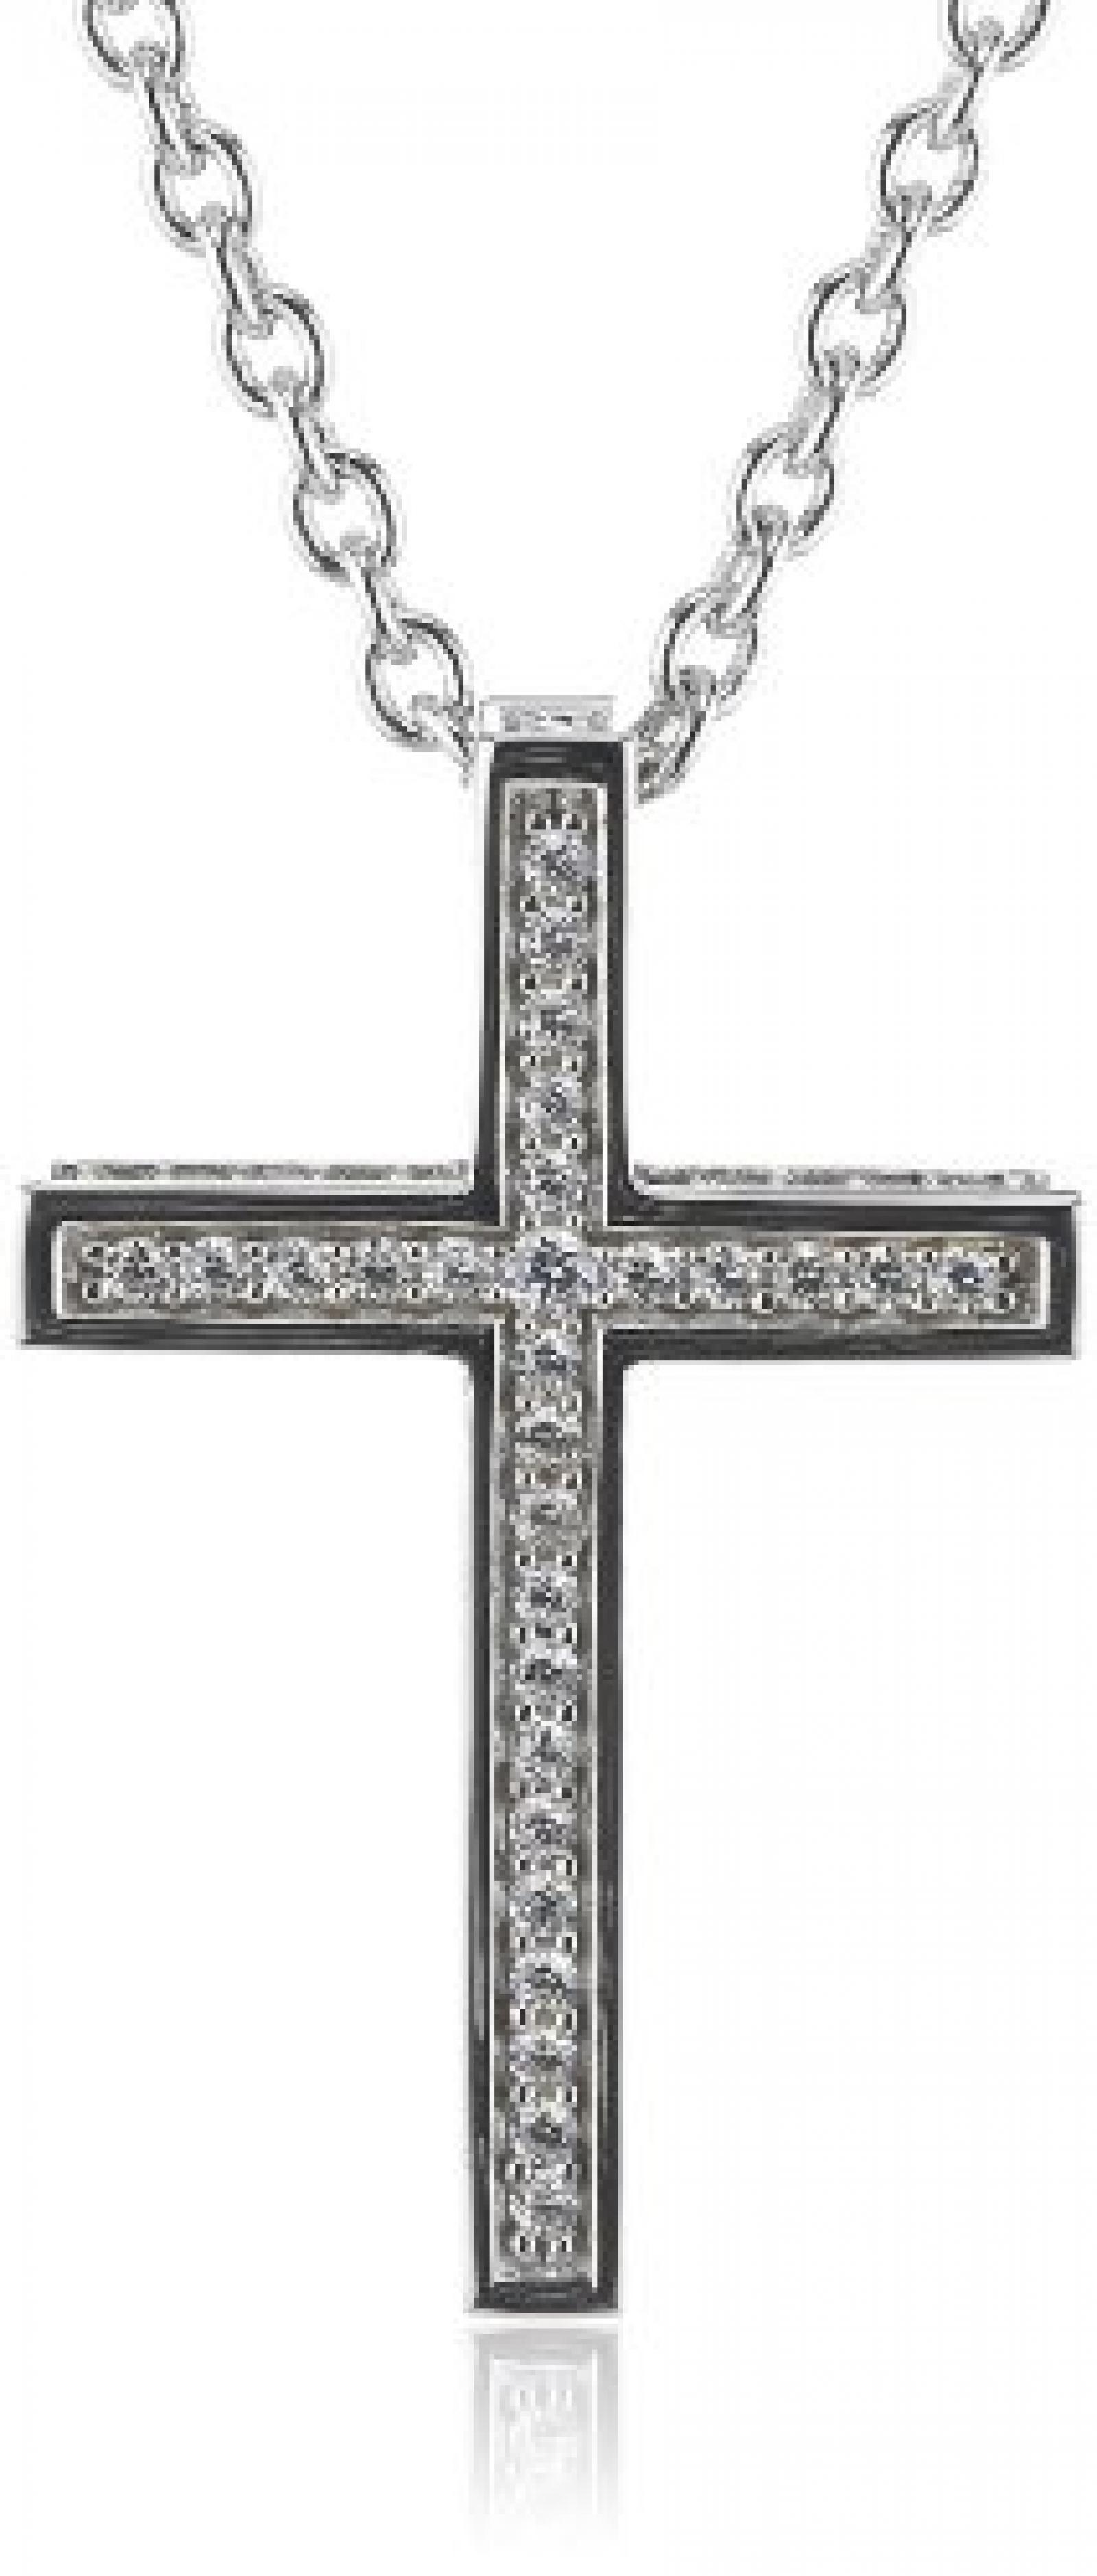 Joop Damen-Halskette mit Anhänger Zirkonia weiss 42+3 cm 925 Sterling Silber JPNL90627A420